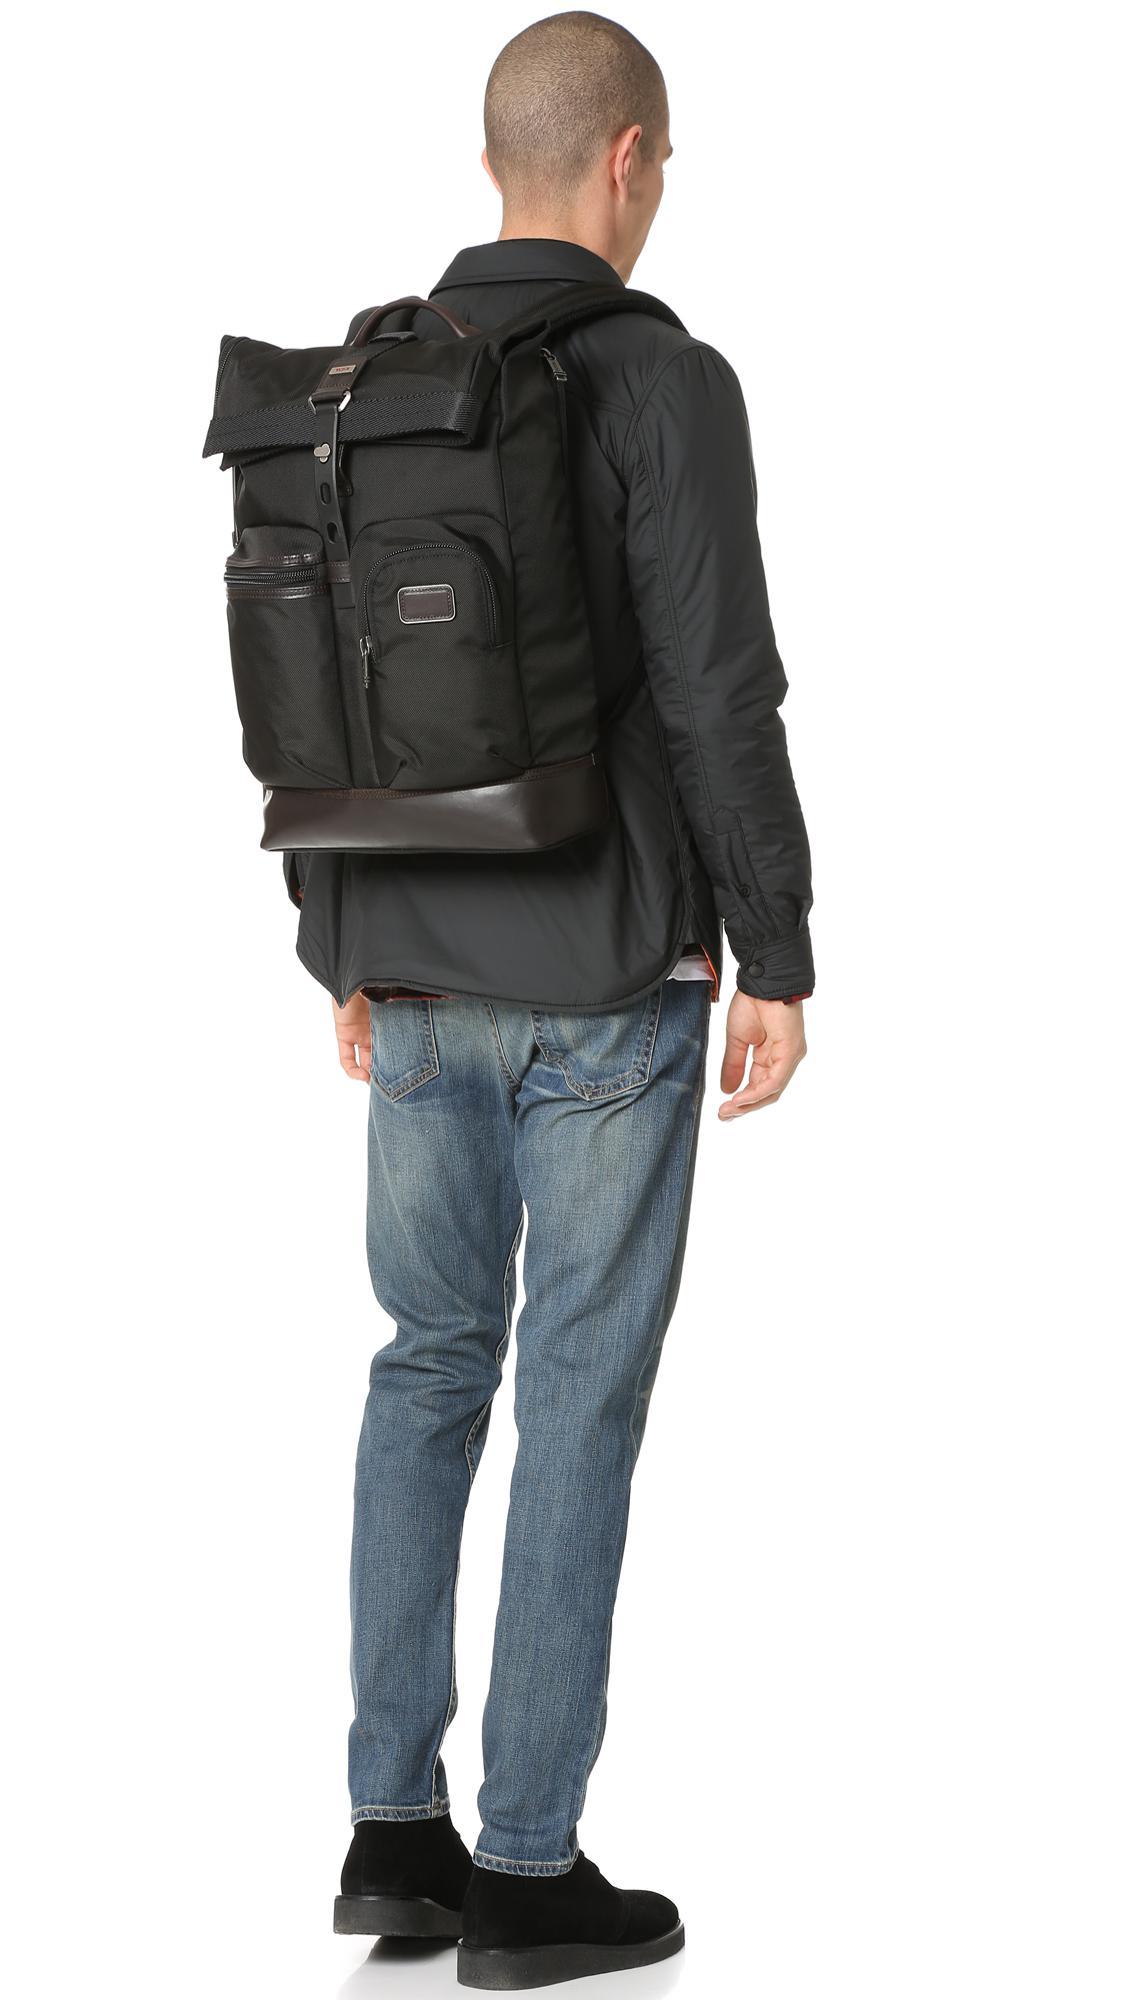 3a98b0aa219 Lyst - Tumi Alpha Bravo Luke Roll Top Backpack in Gray for Men